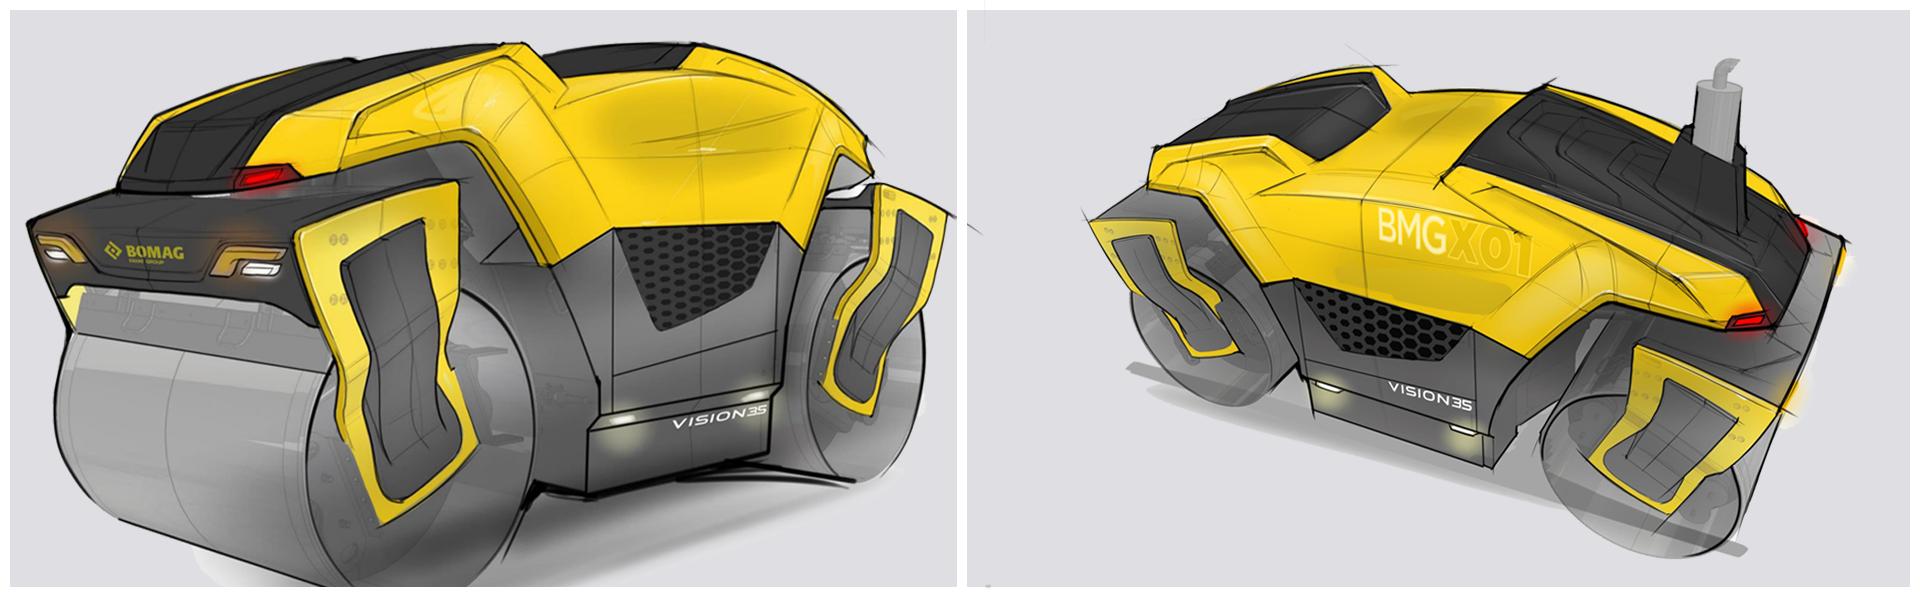 hilti-industrial design-design agency-germany